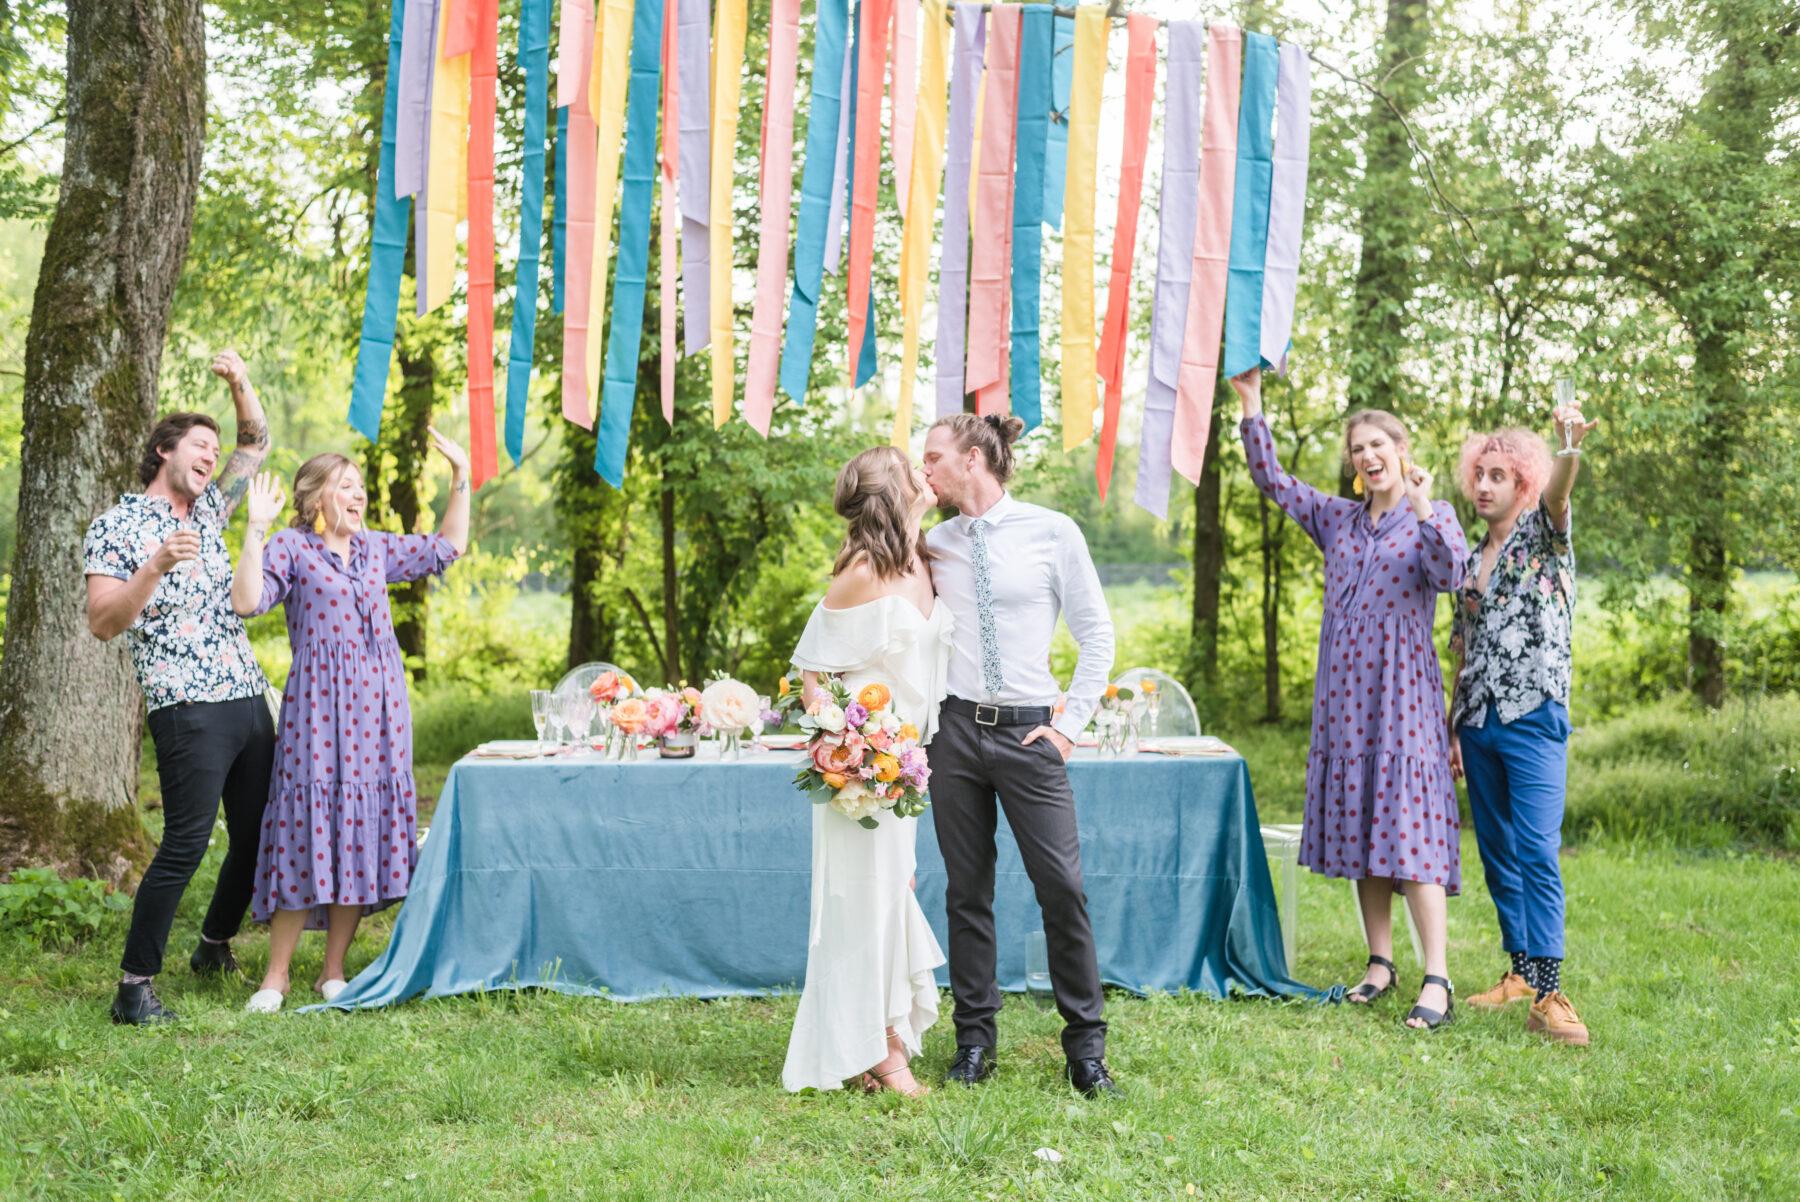 Purple polka dotted bridesmaid dresses